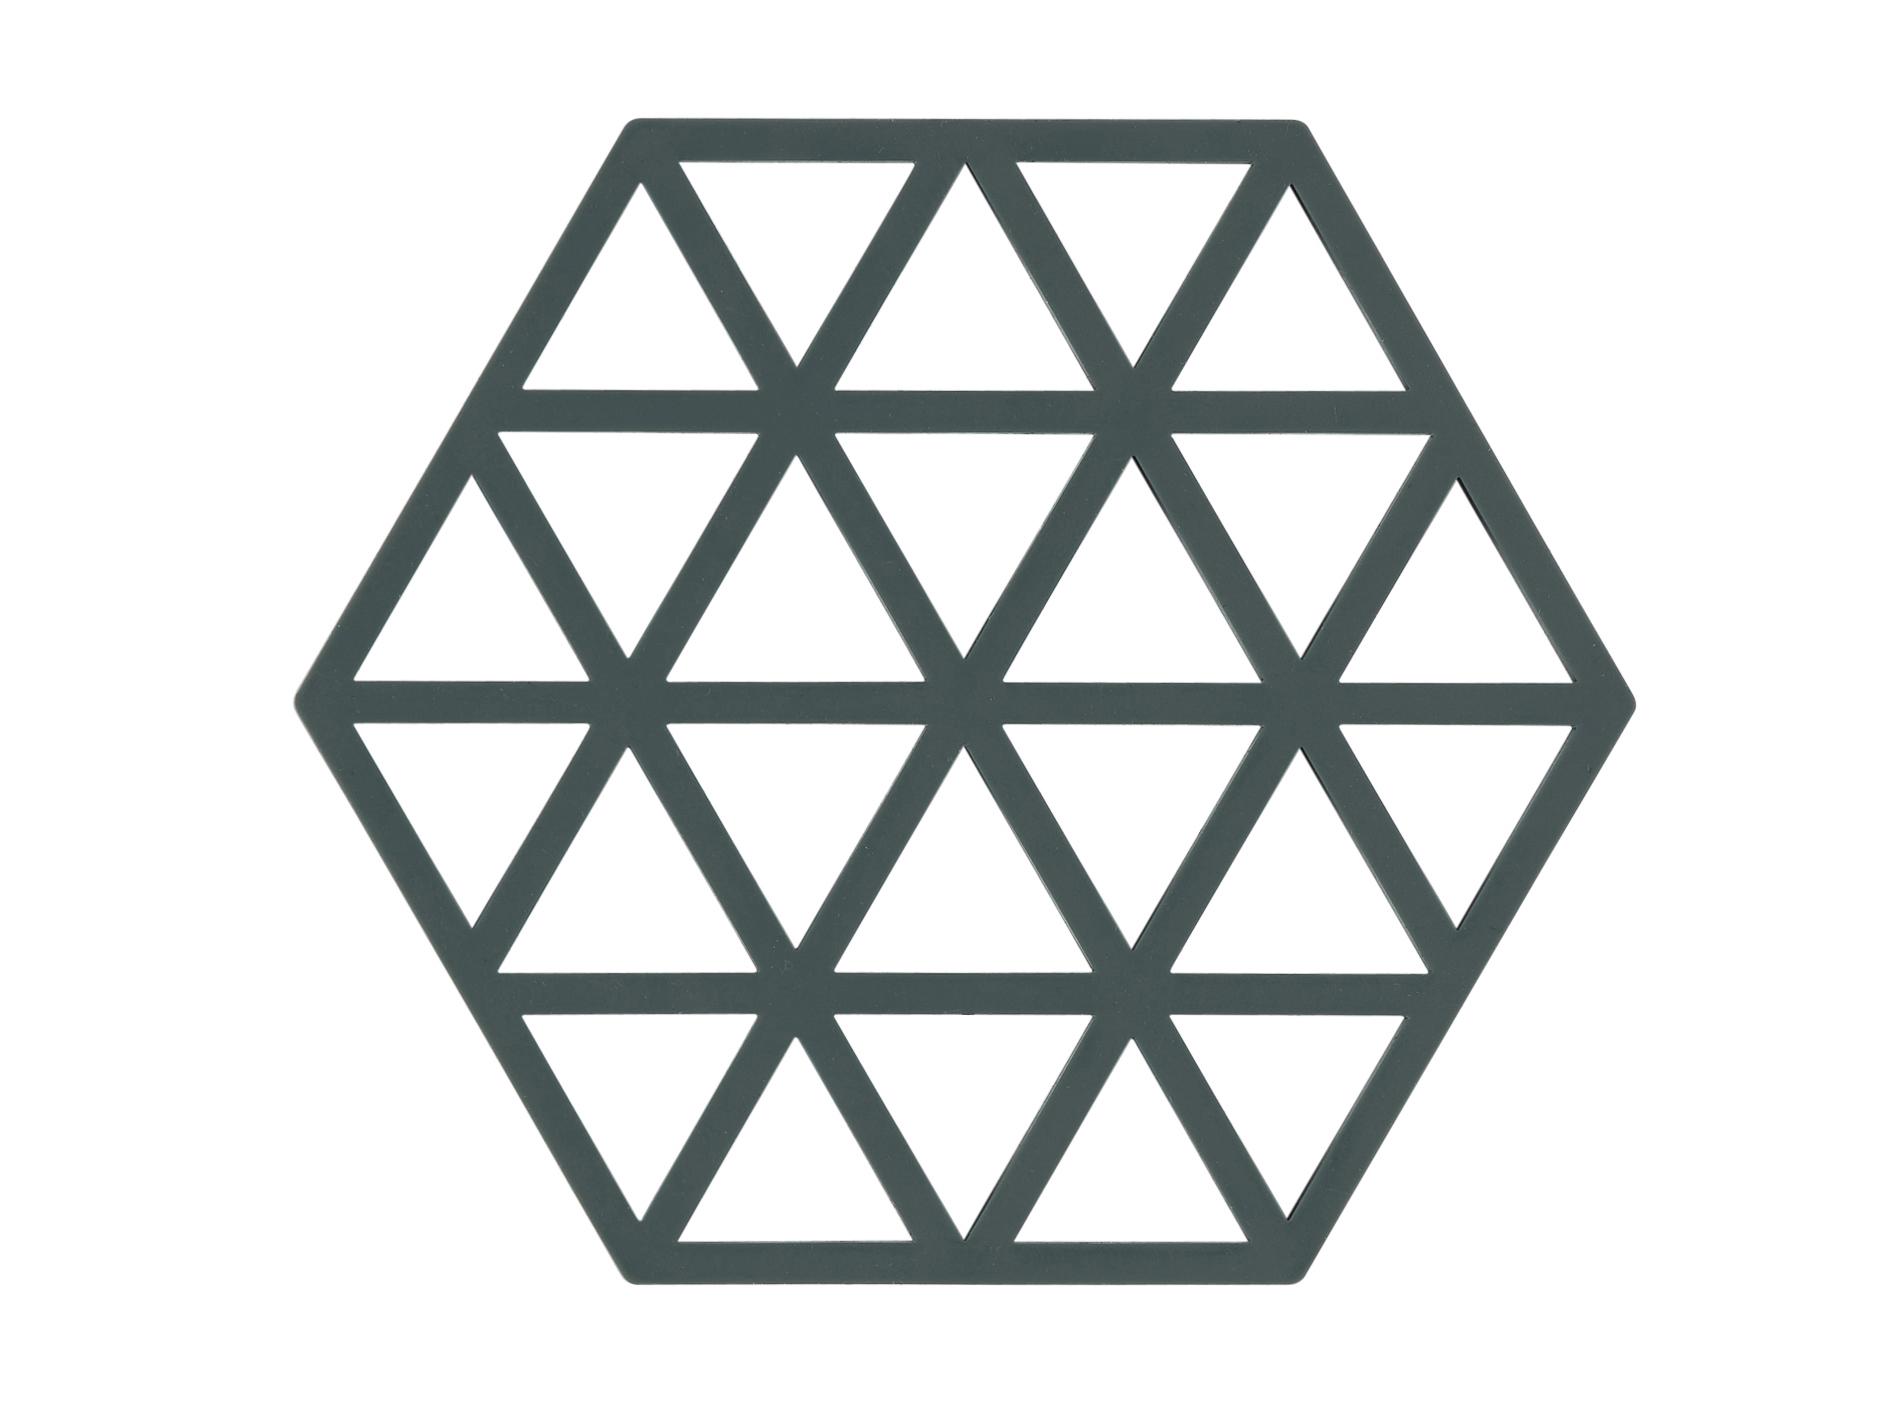 Zone Triangles bordskåner, cactus